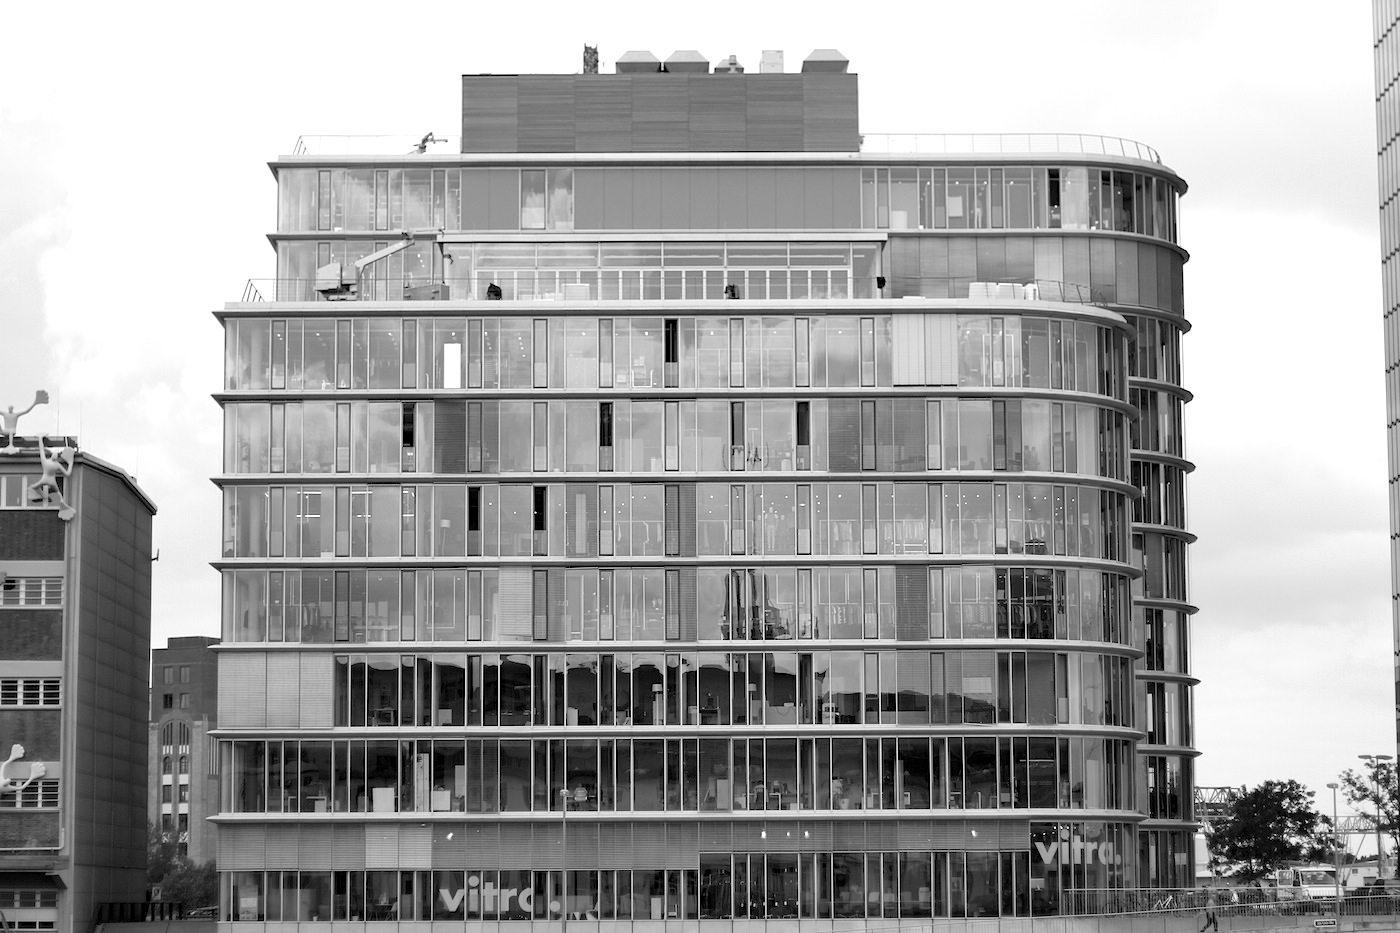 Speditionstraße 17.  By Ingenhoven Overdiek Architekten. Completion: 2002